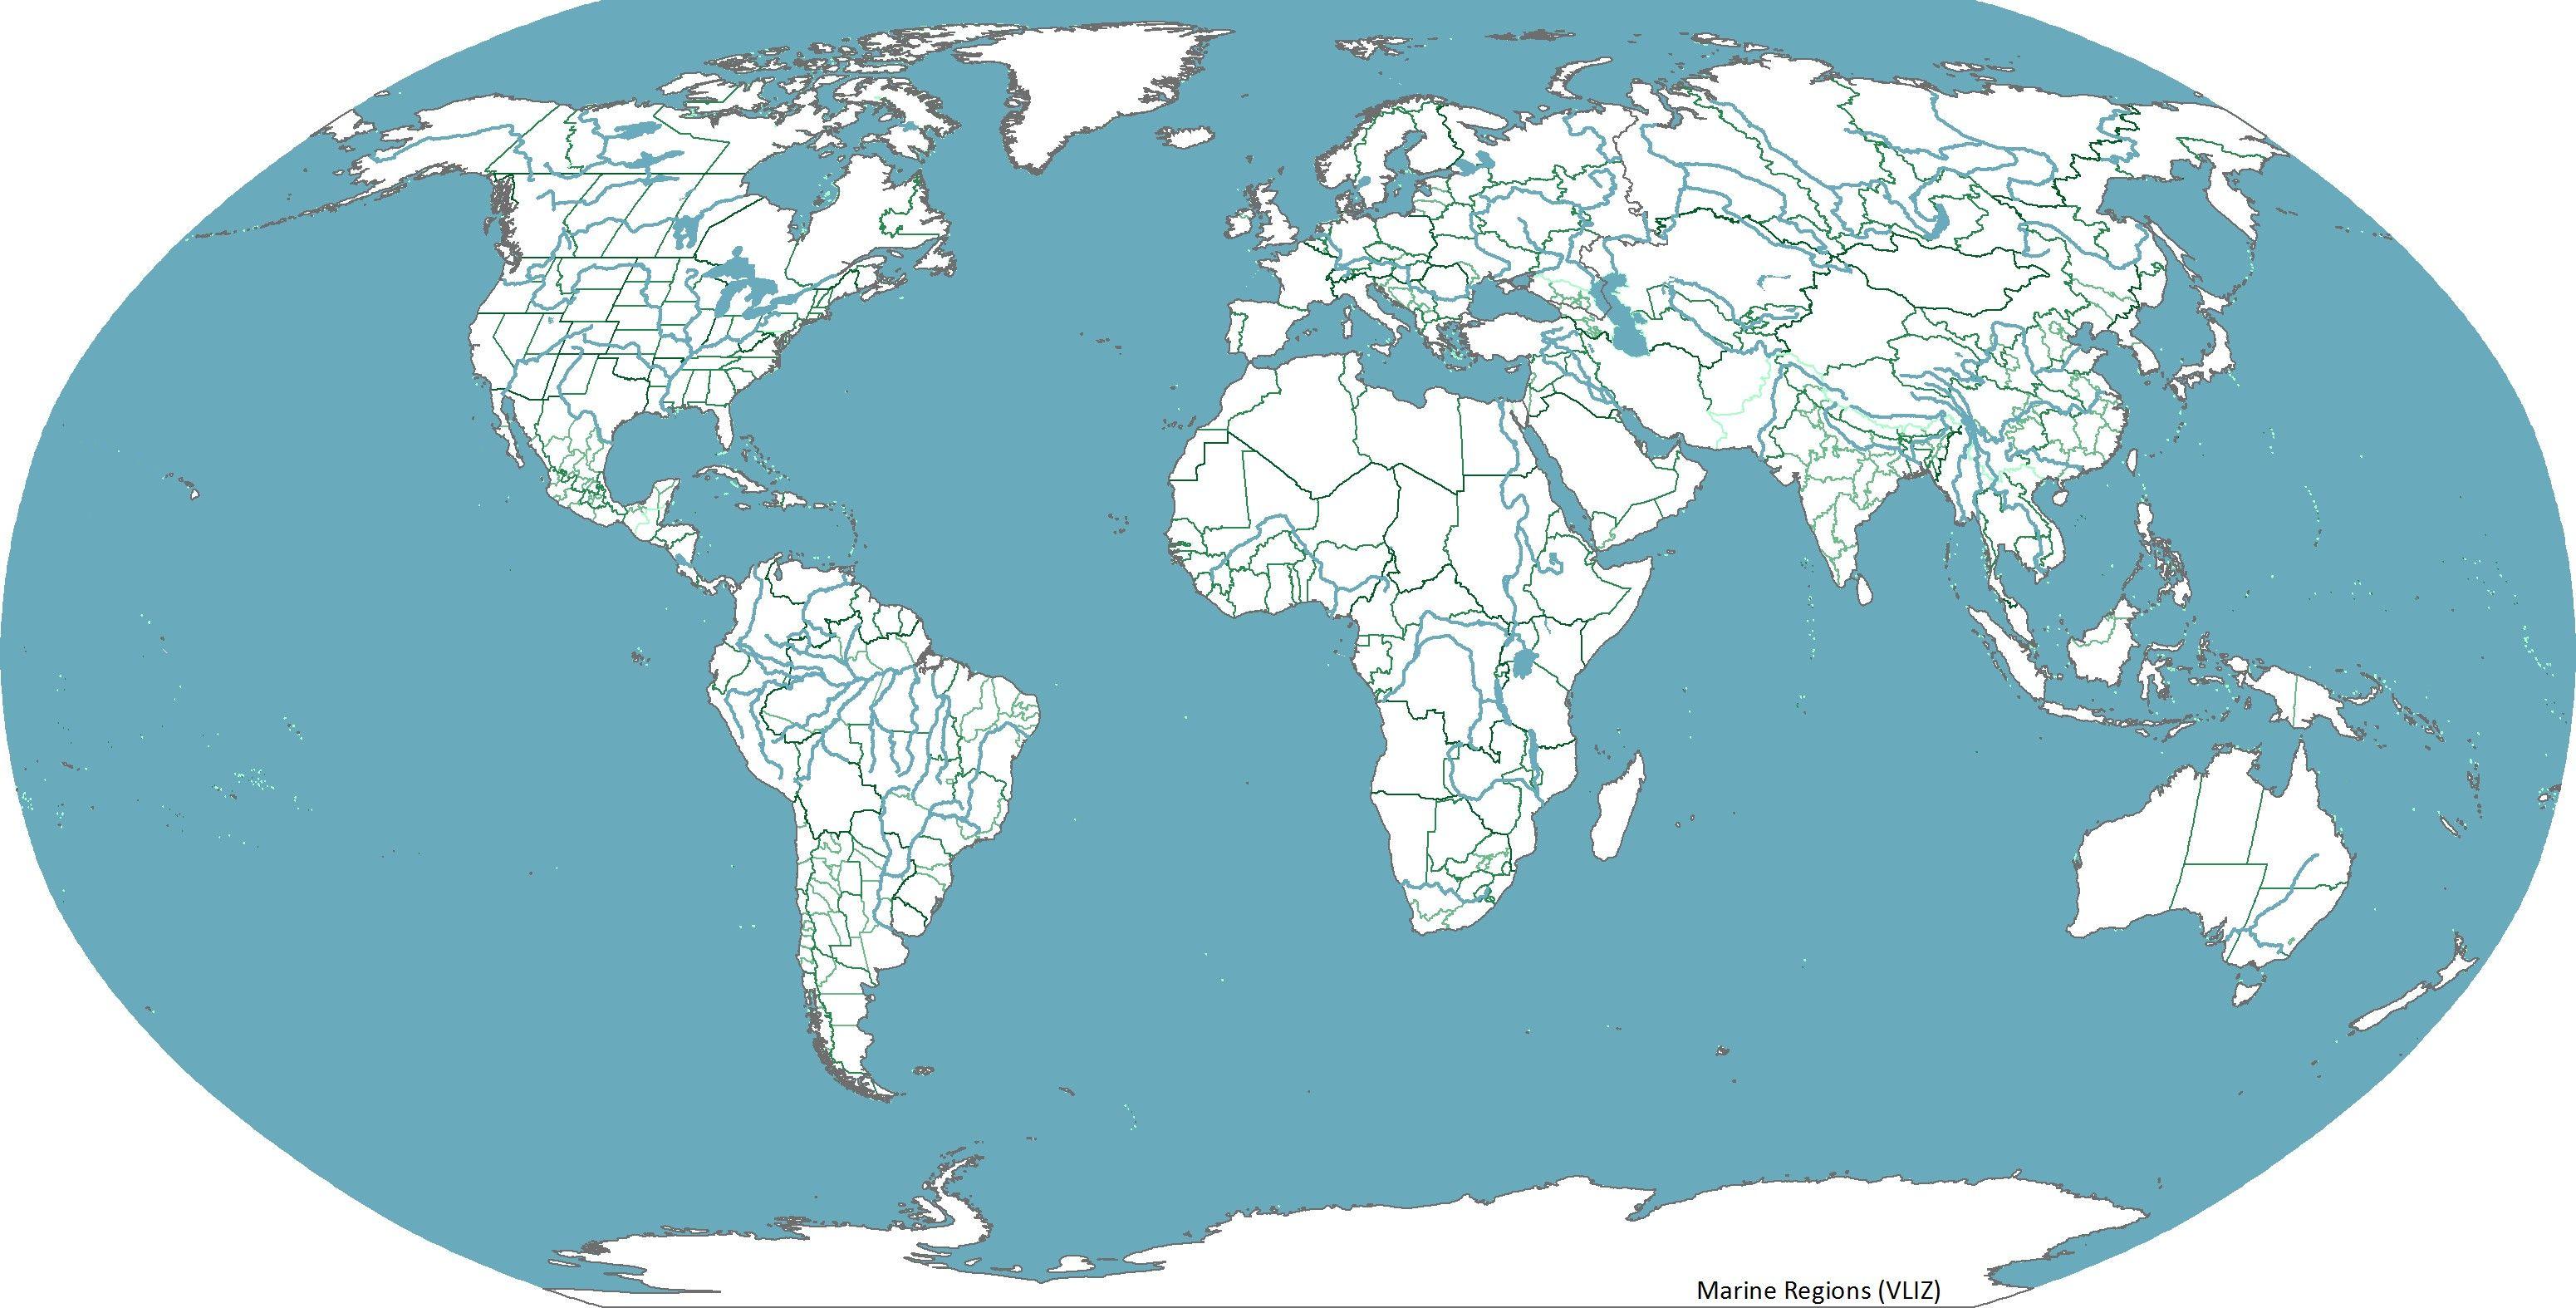 Amazing World Map Without Names 11